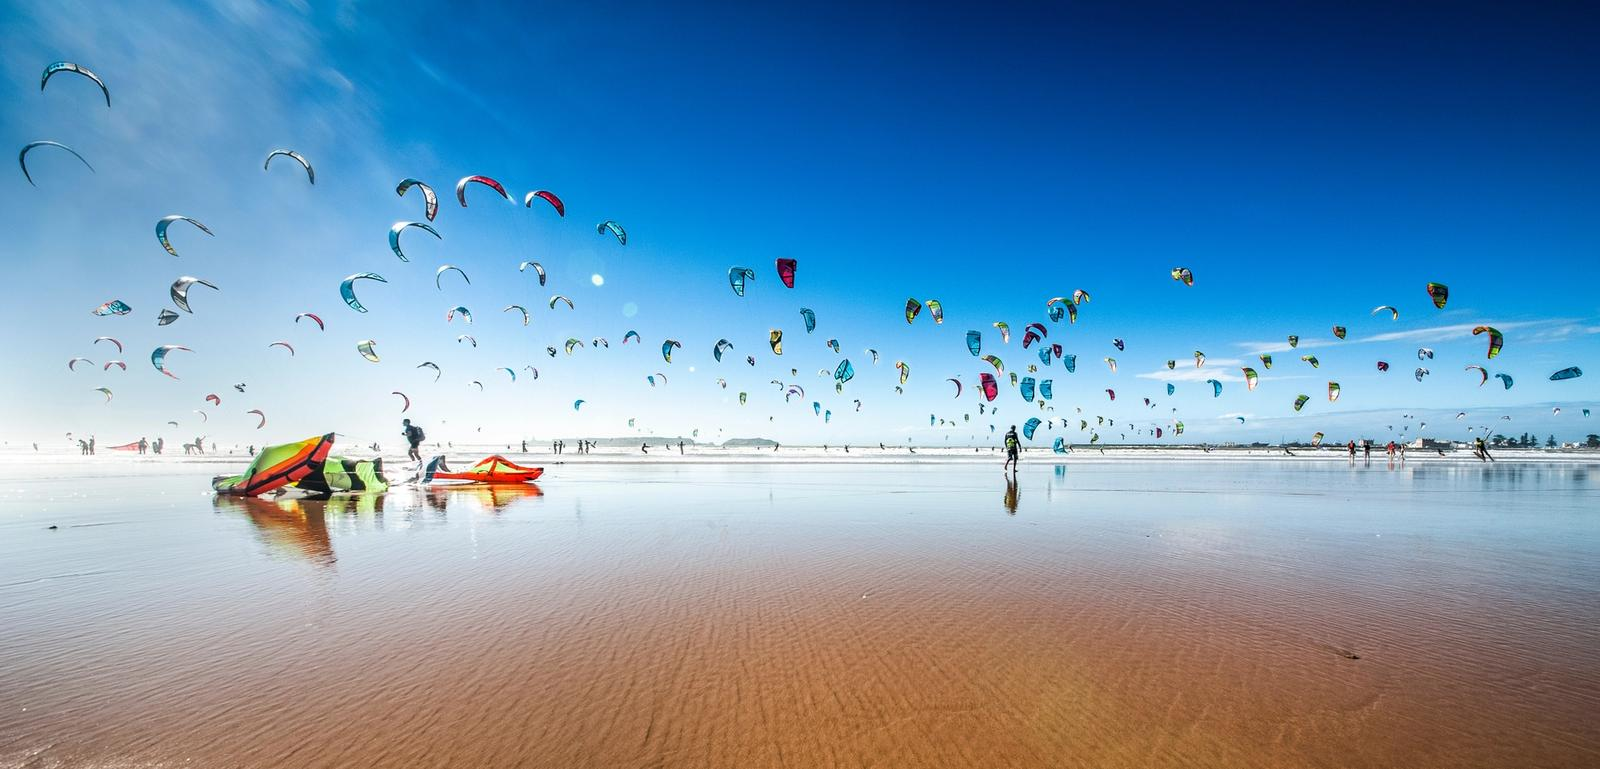 viaggi kitesurf organizzati